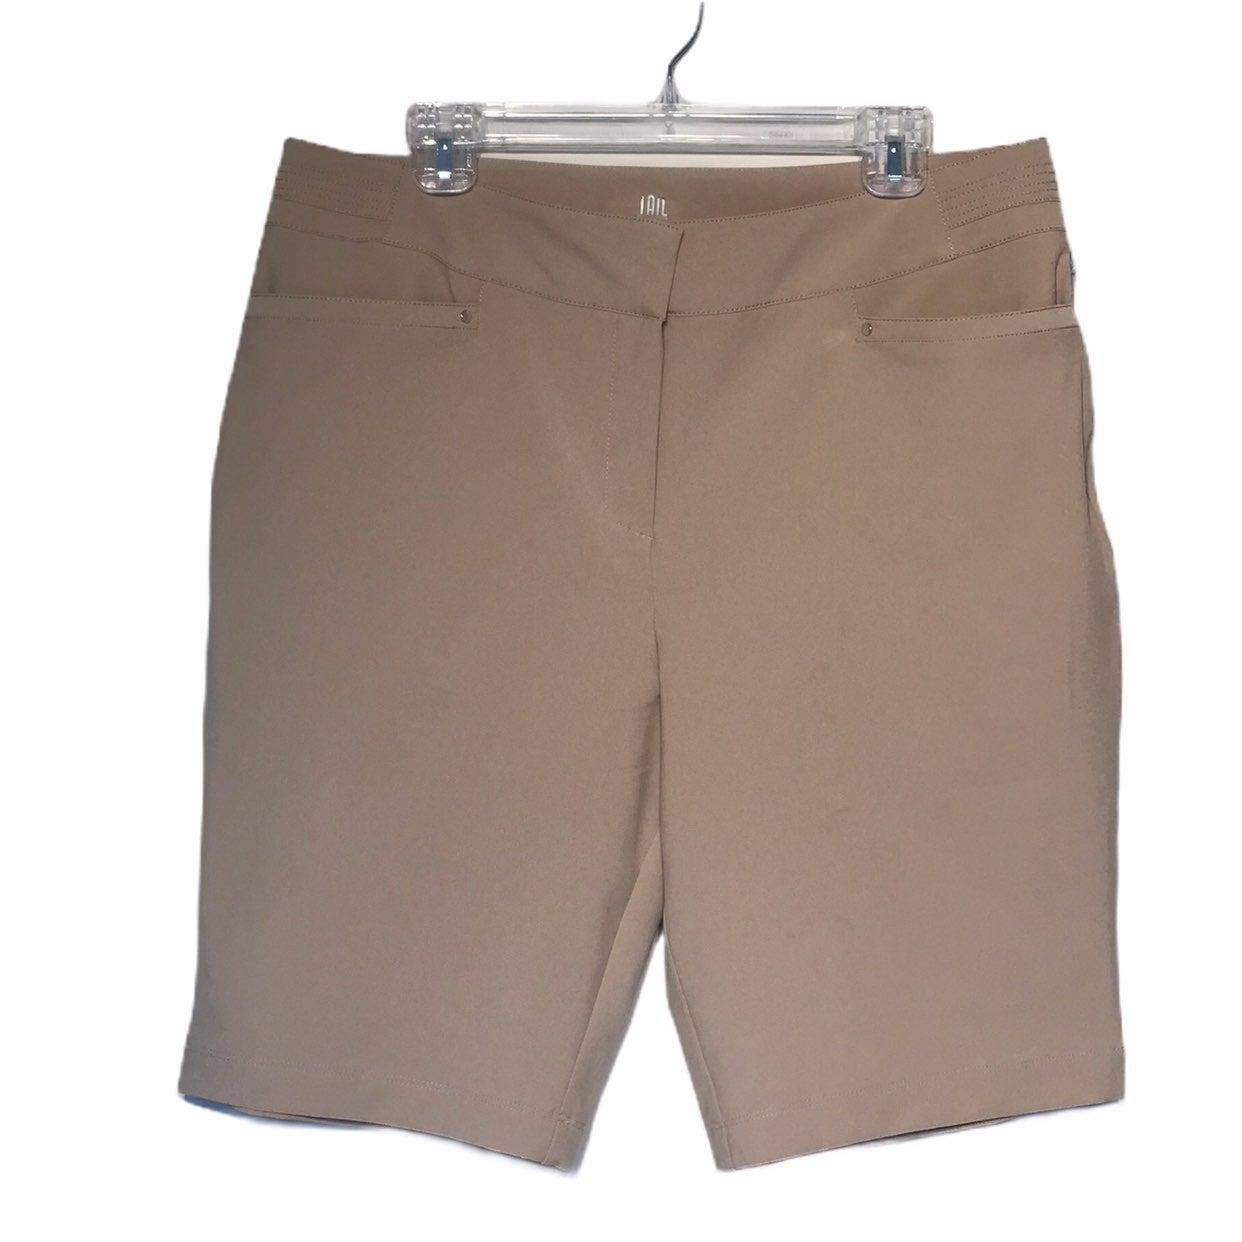 Tail Golf Activewear UPF 40+ Shorts